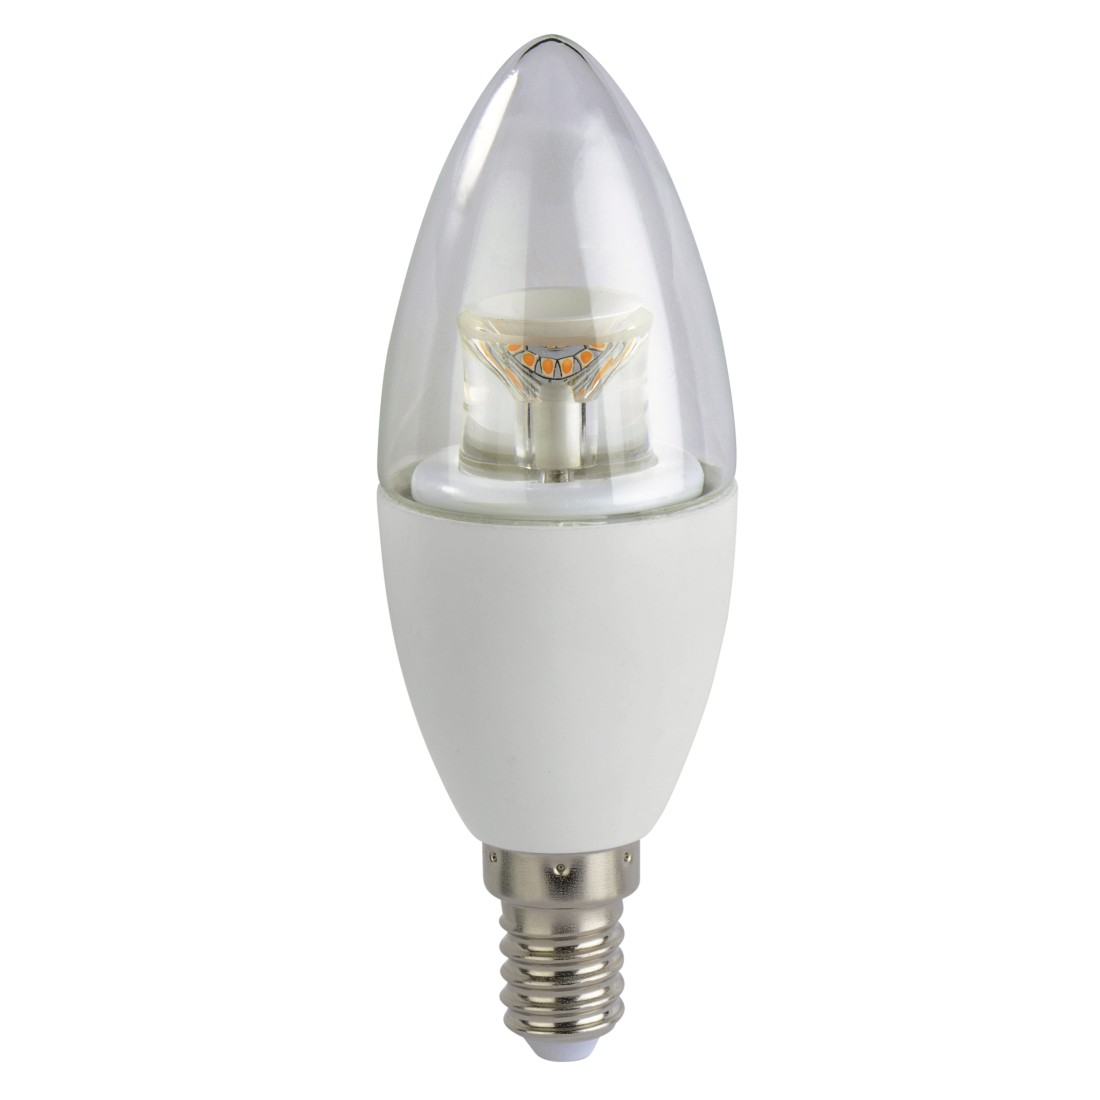 xavax.eu | 00112174 Xavax LED-Lampe, E14, 470lm ersetzt 40W ...